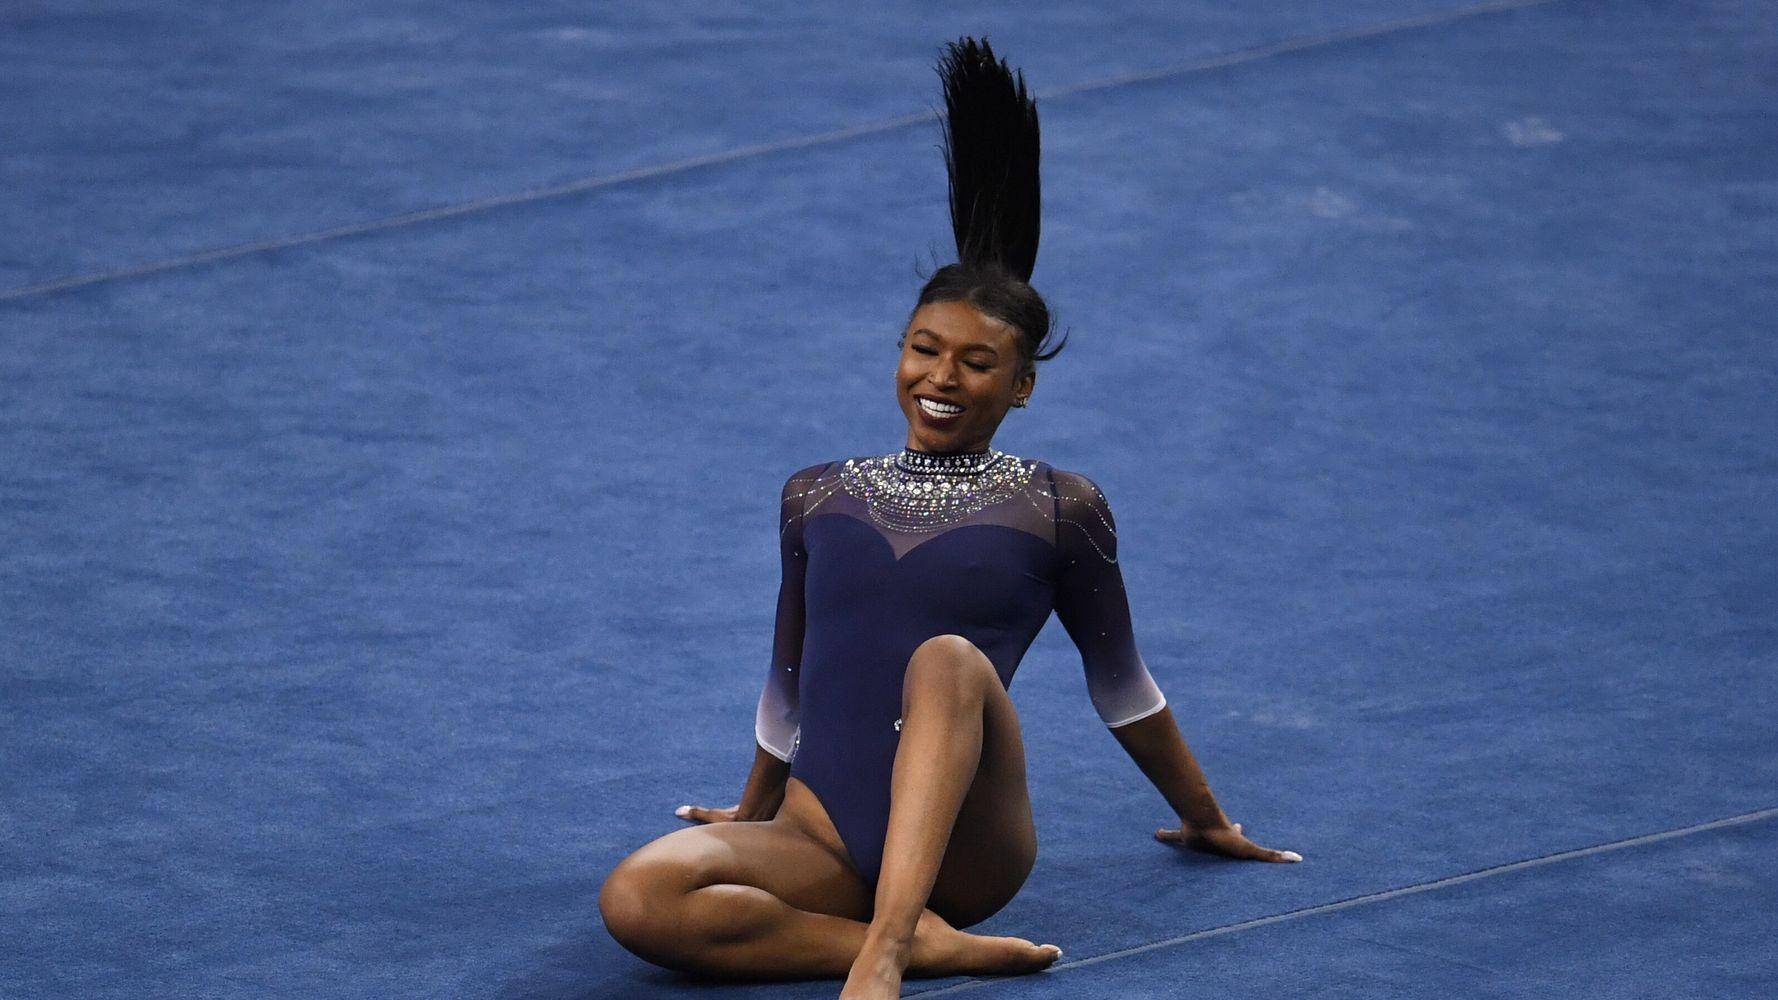 UCLA Gymnast Nia Dennis' Viral Floor Routine Was An Ode To Black Culture